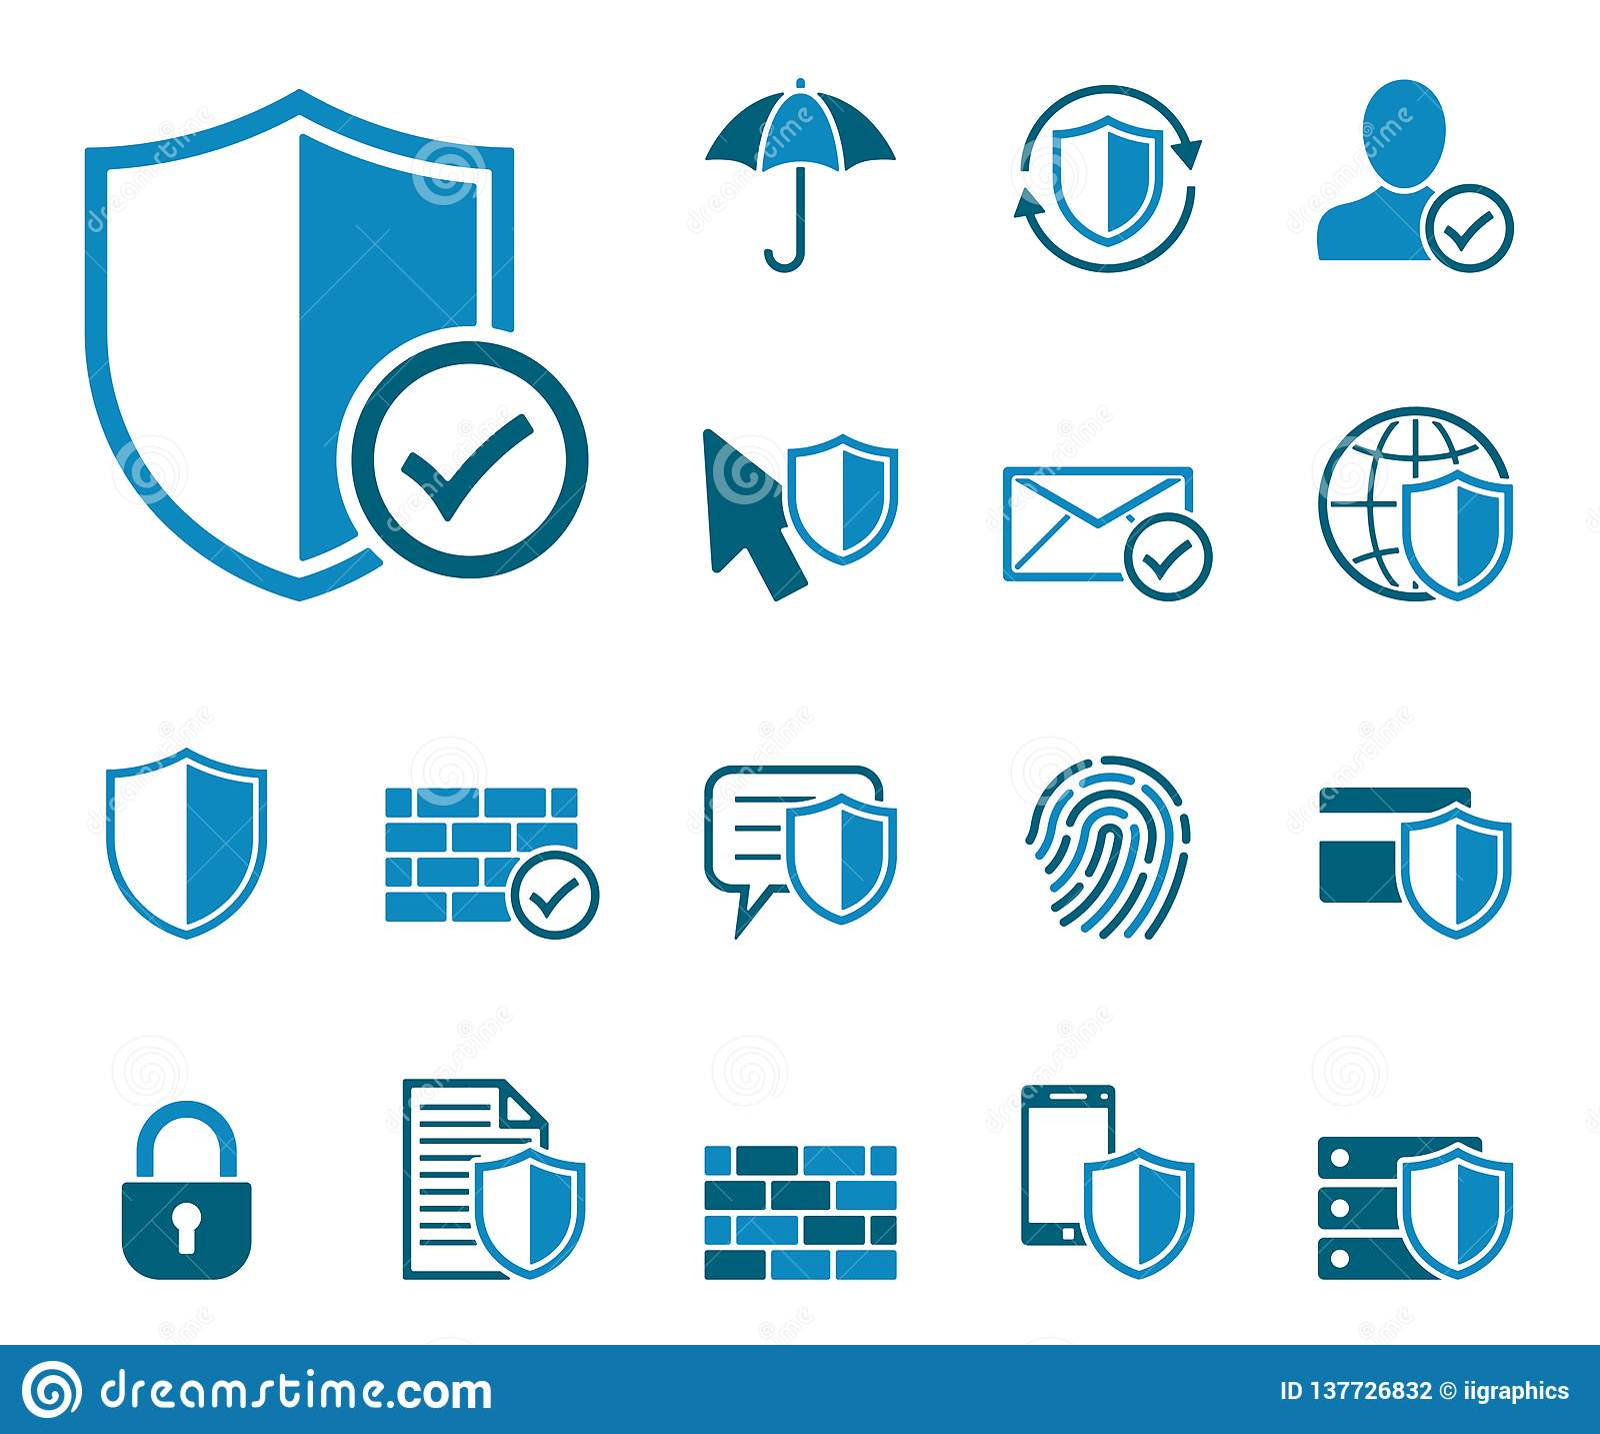 Datenschutz-Ikonensatz